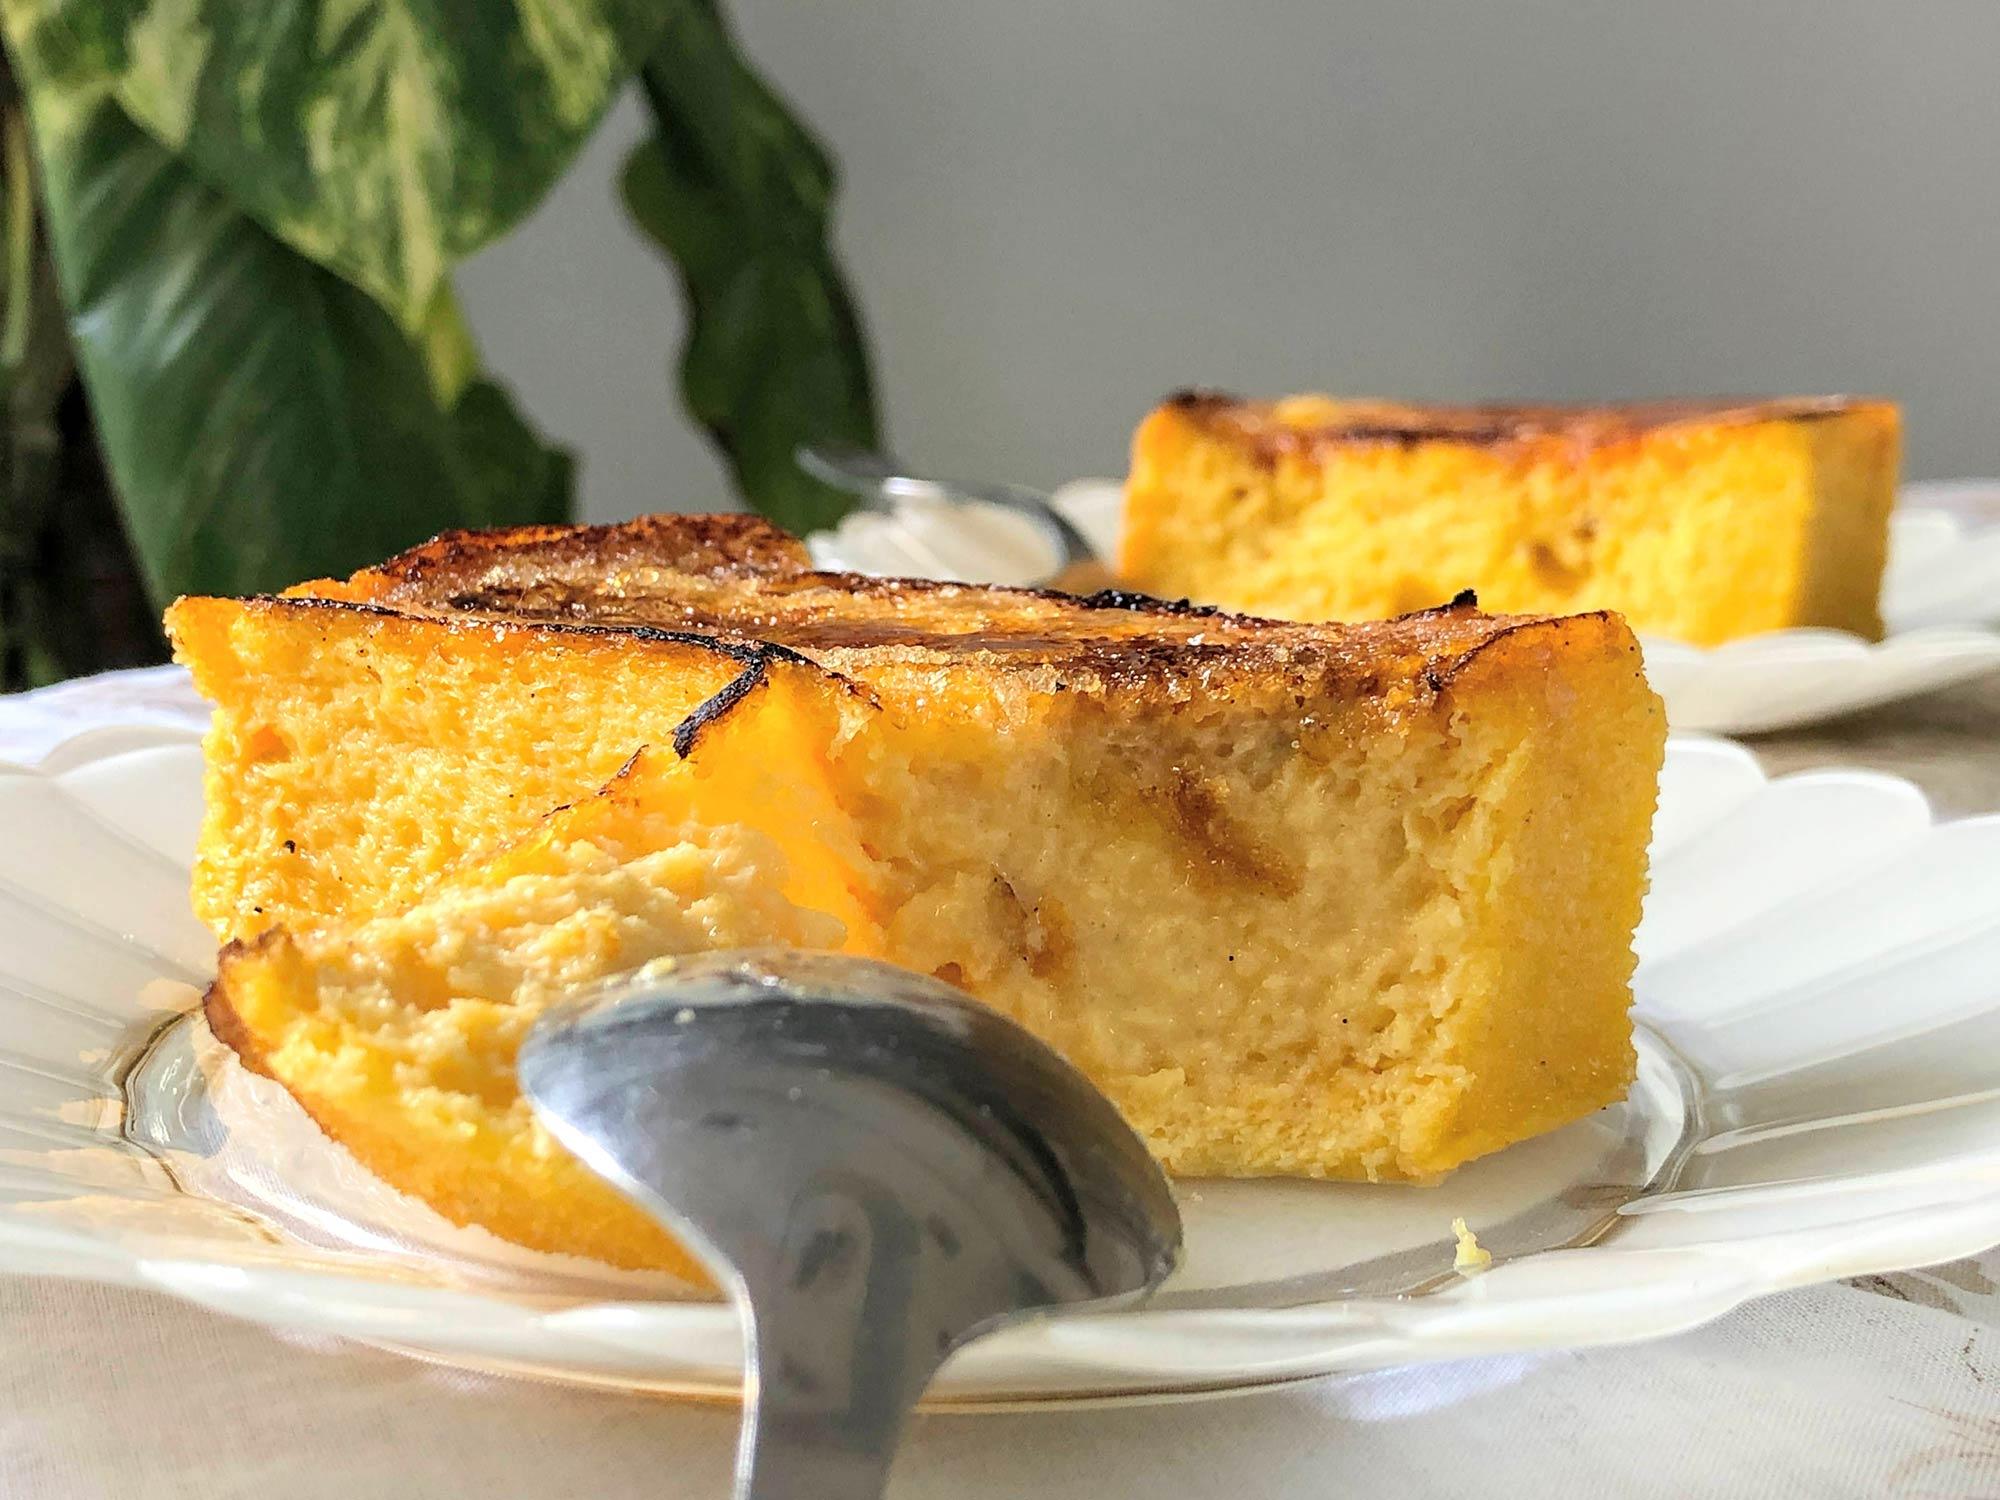 The brûléed, custard-soaked torrija from Panem